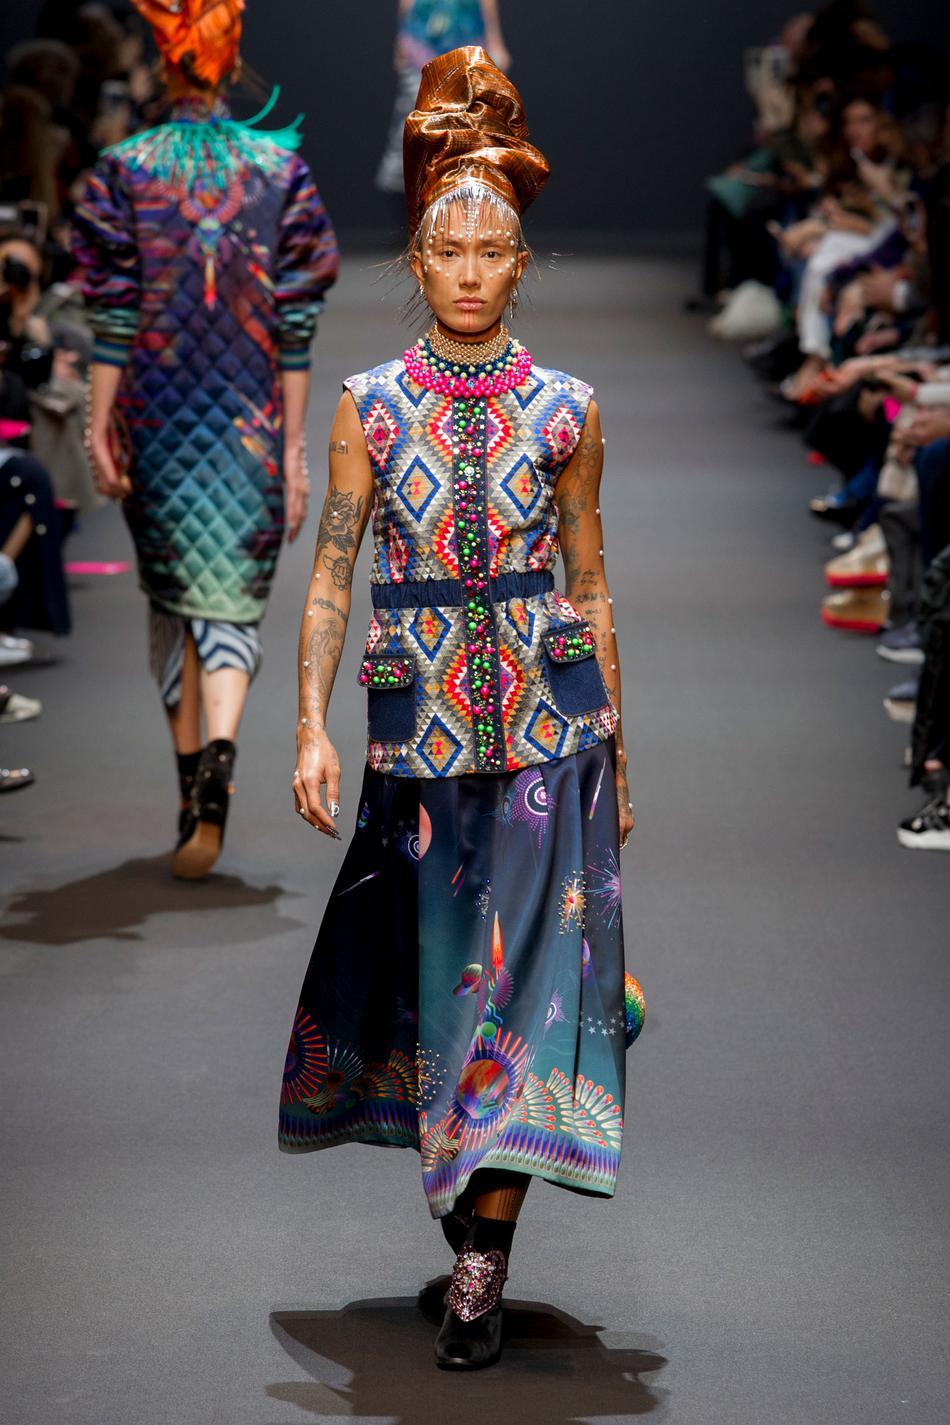 Défilé Manish Arora Fashion Week 2017 - Look 3